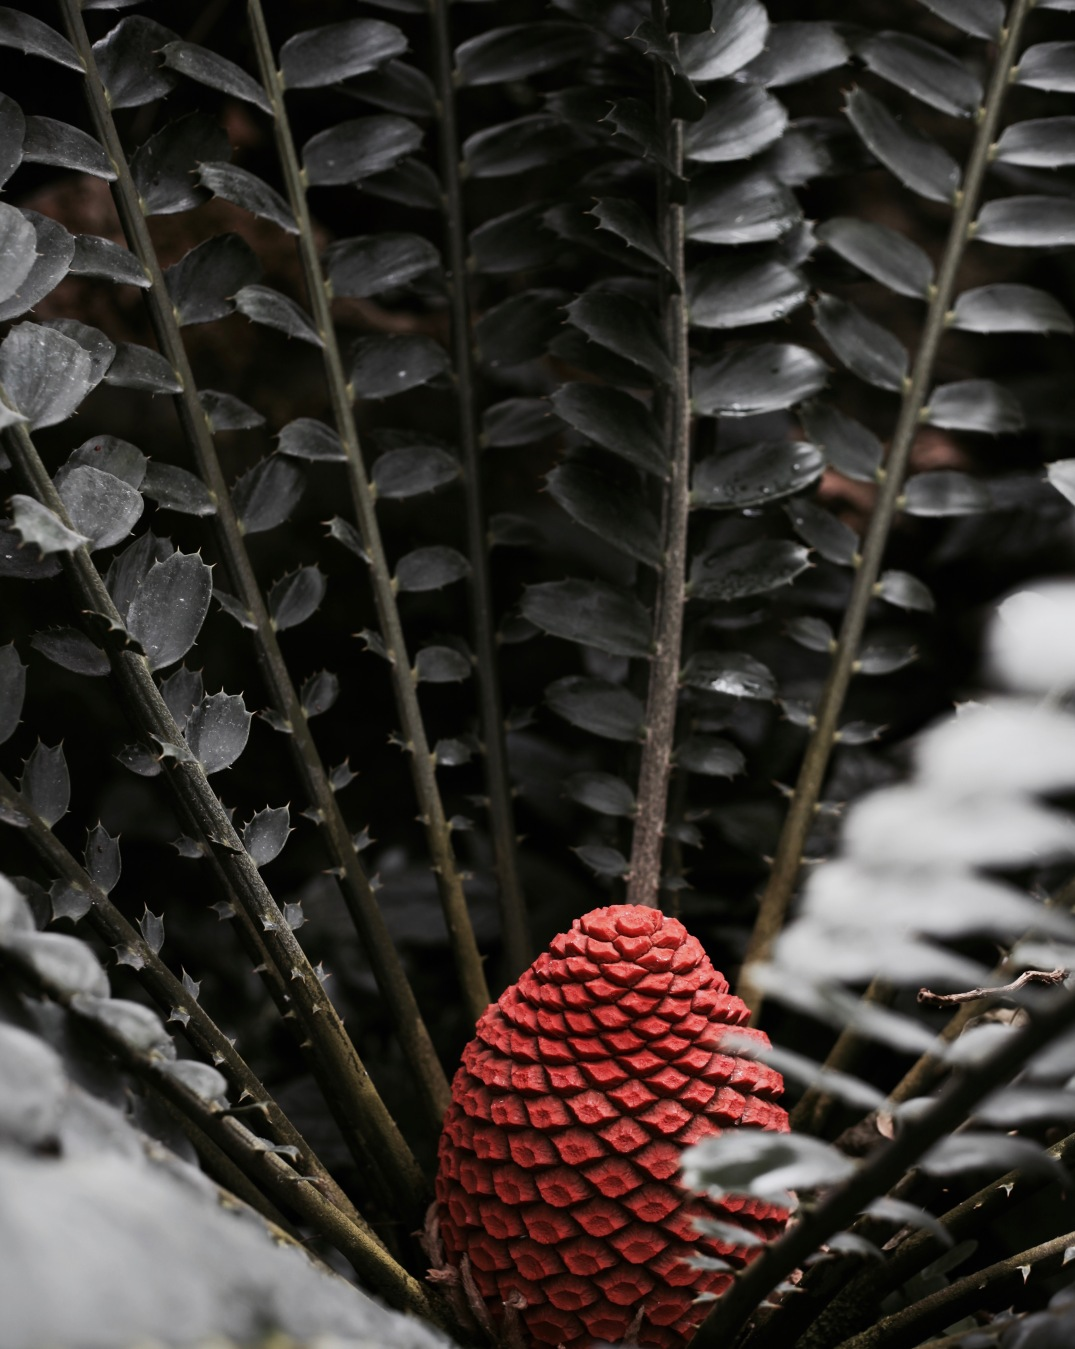 details at botanical garden in Munich, Germany